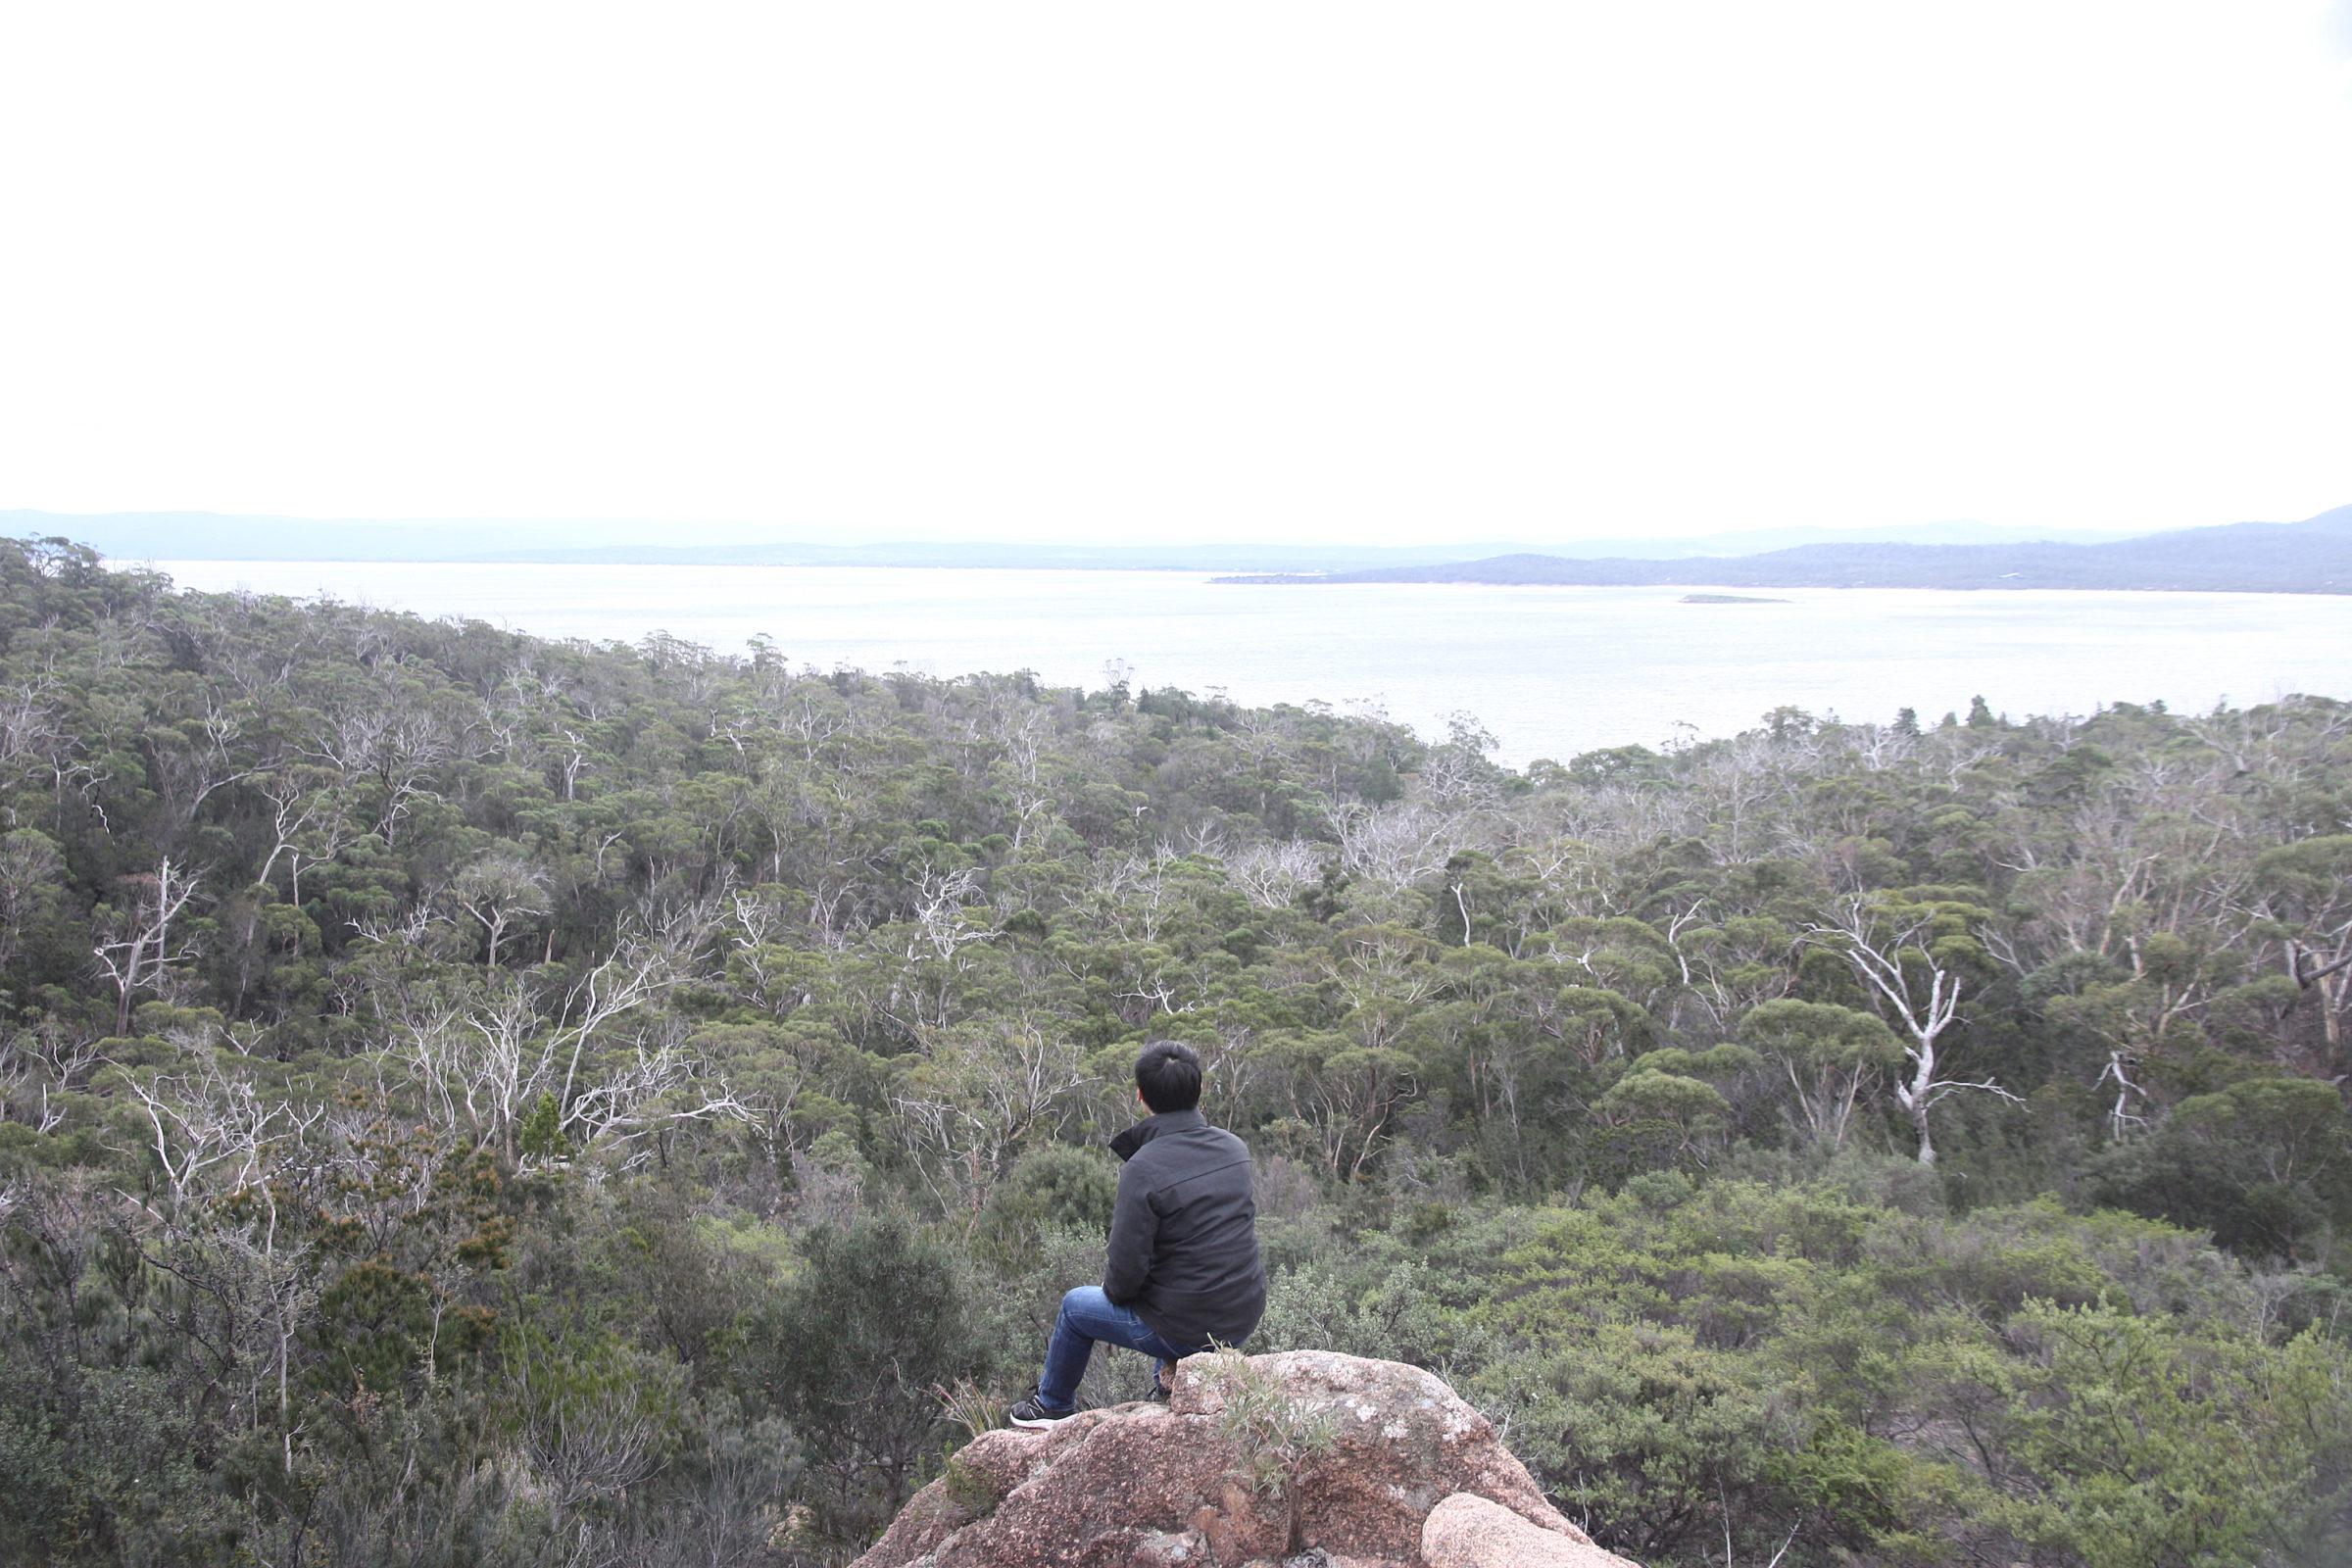 Tasmania Road Trip Itinerary, Day 5: Freycinet National Park